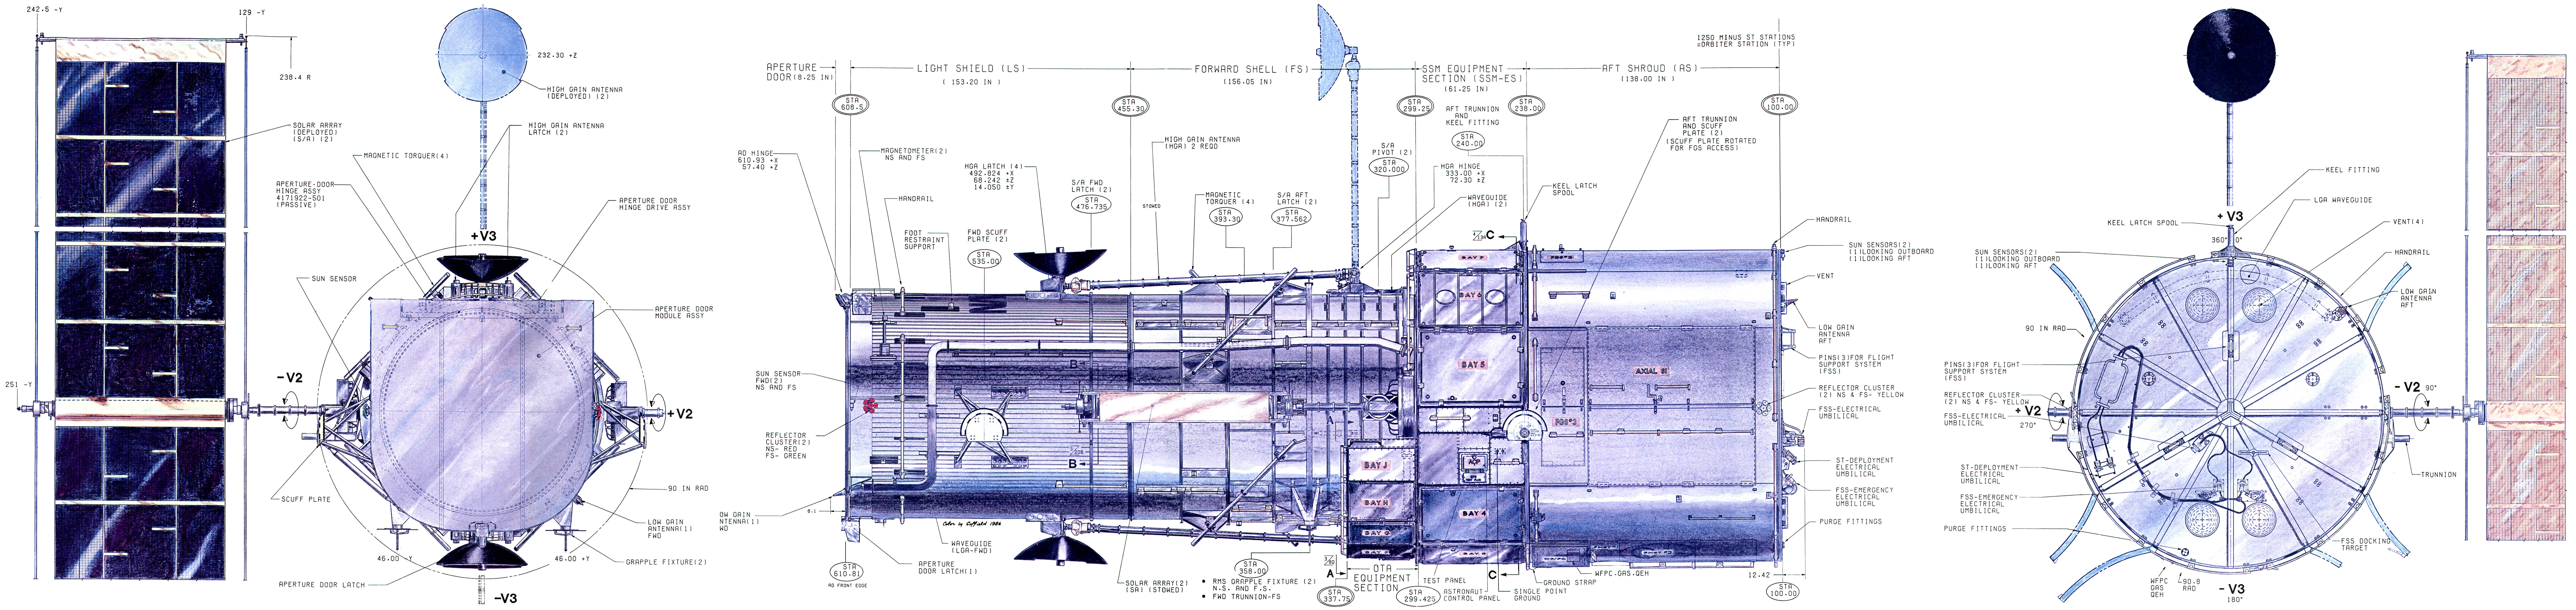 hubble_diagram diagram of the hubble space telescope, 1981 esa hubble